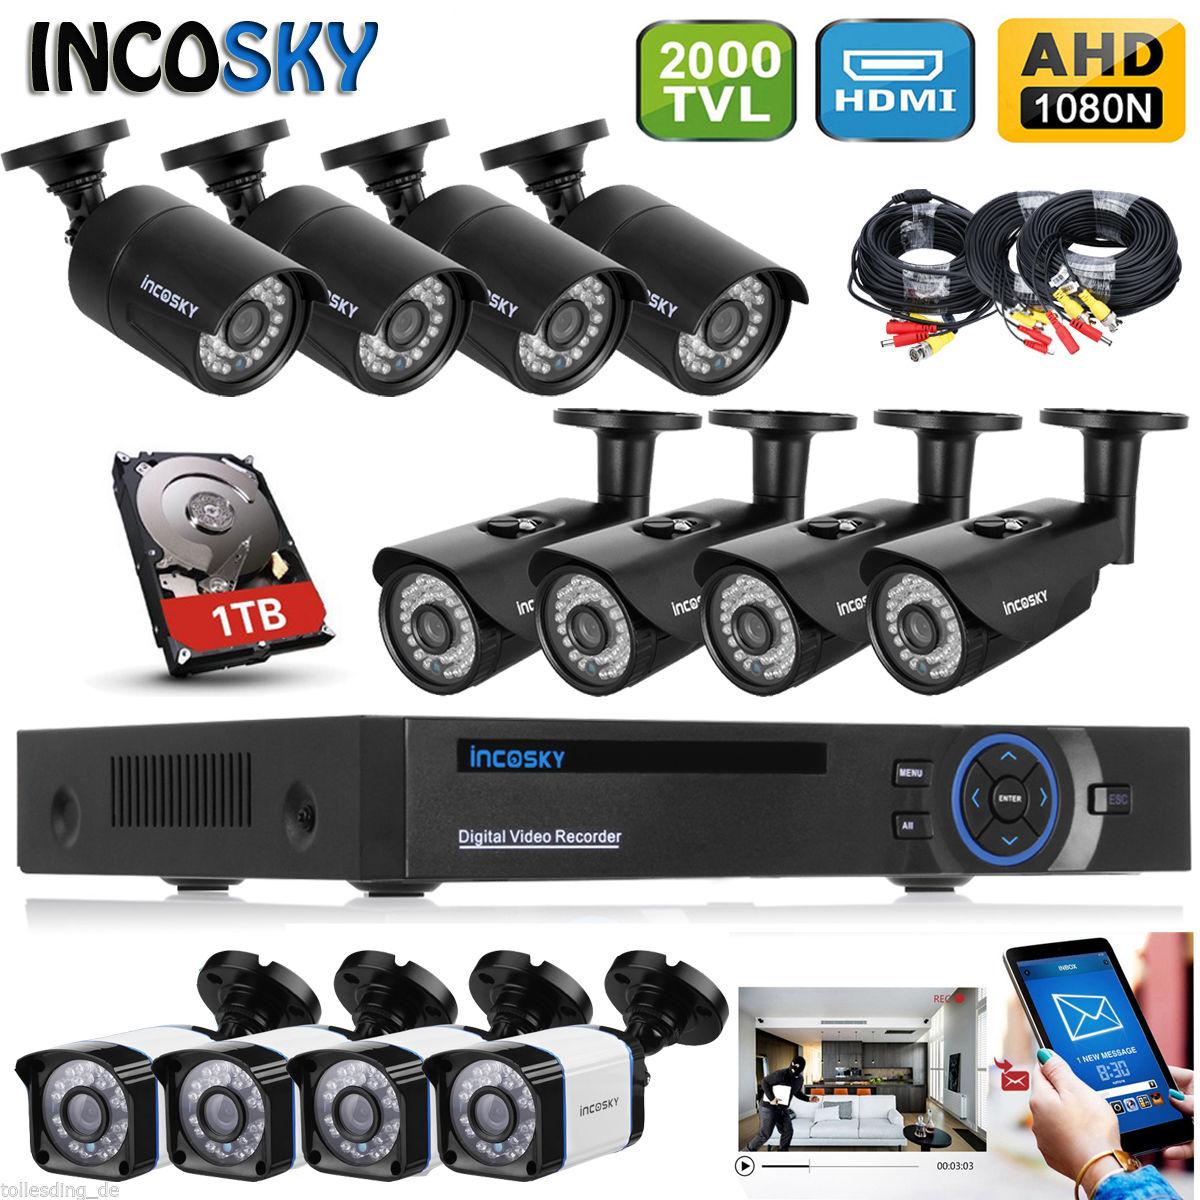 1TB HDD 8CH AHD HDMI DVR Outside 00TVL/1500TVL CCTV security Digicam System UK